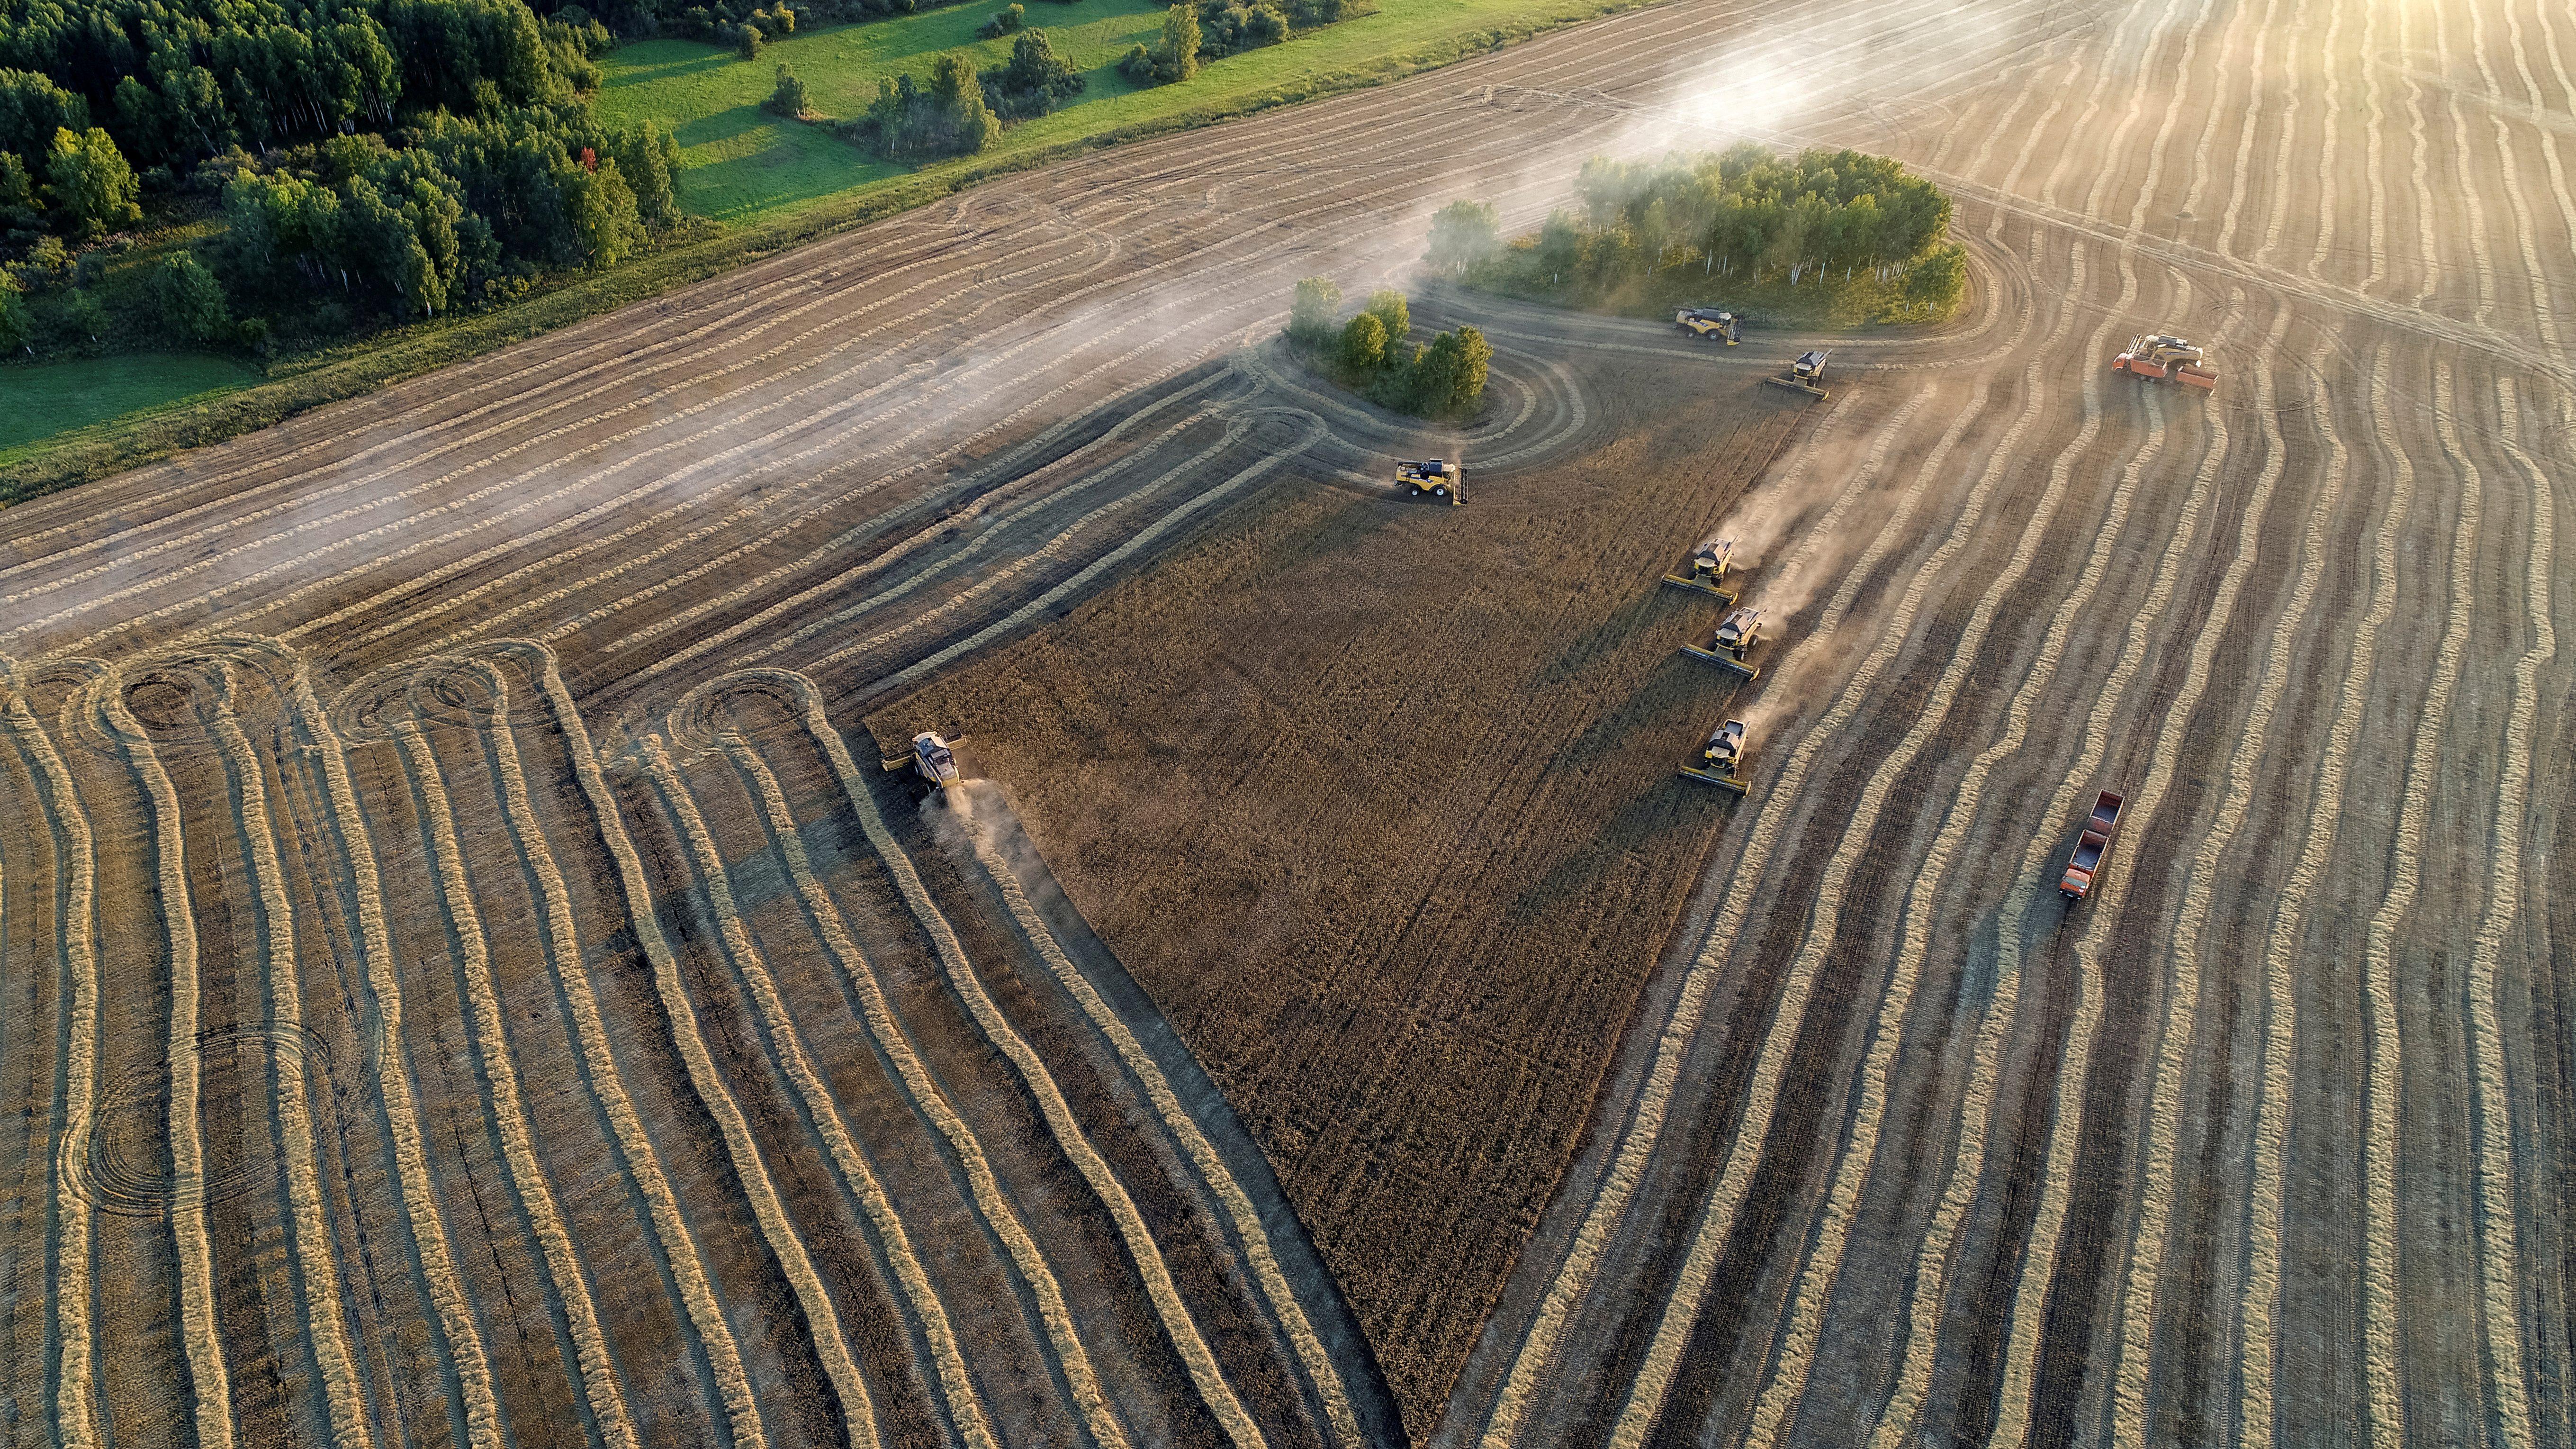 An aerial view shows combines harvesting wheat at the Solgonskoye private farm outside the Siberian village of Talniki in the Krasnoyarsk region